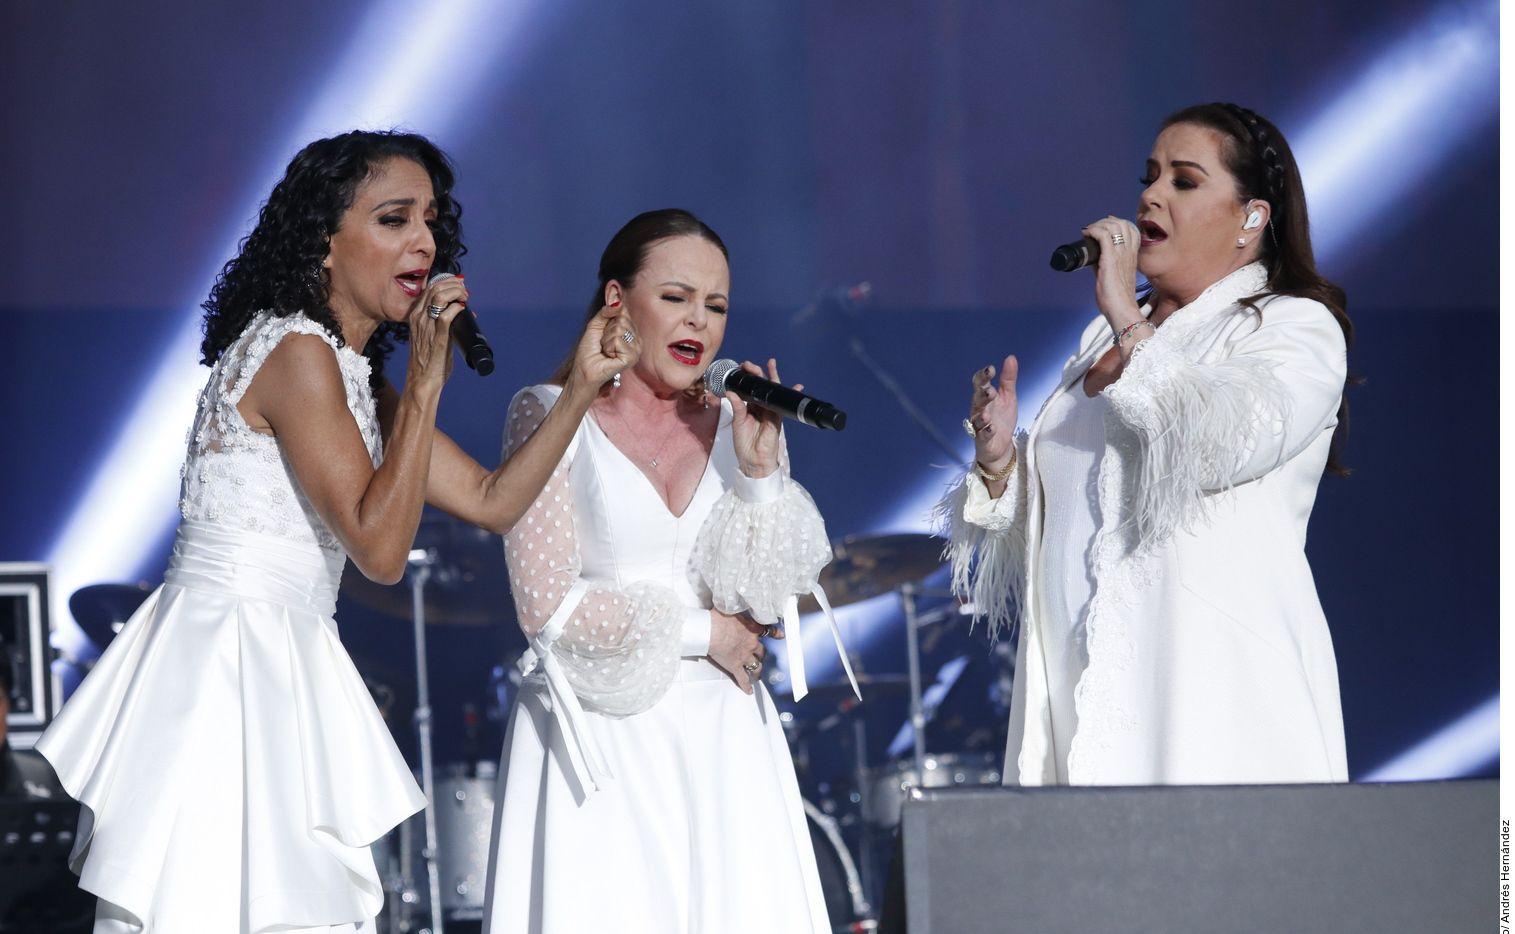 Mayte, Fernanda e Isabel cantaron 'Campana Sobre Campana' junto con Yuri.